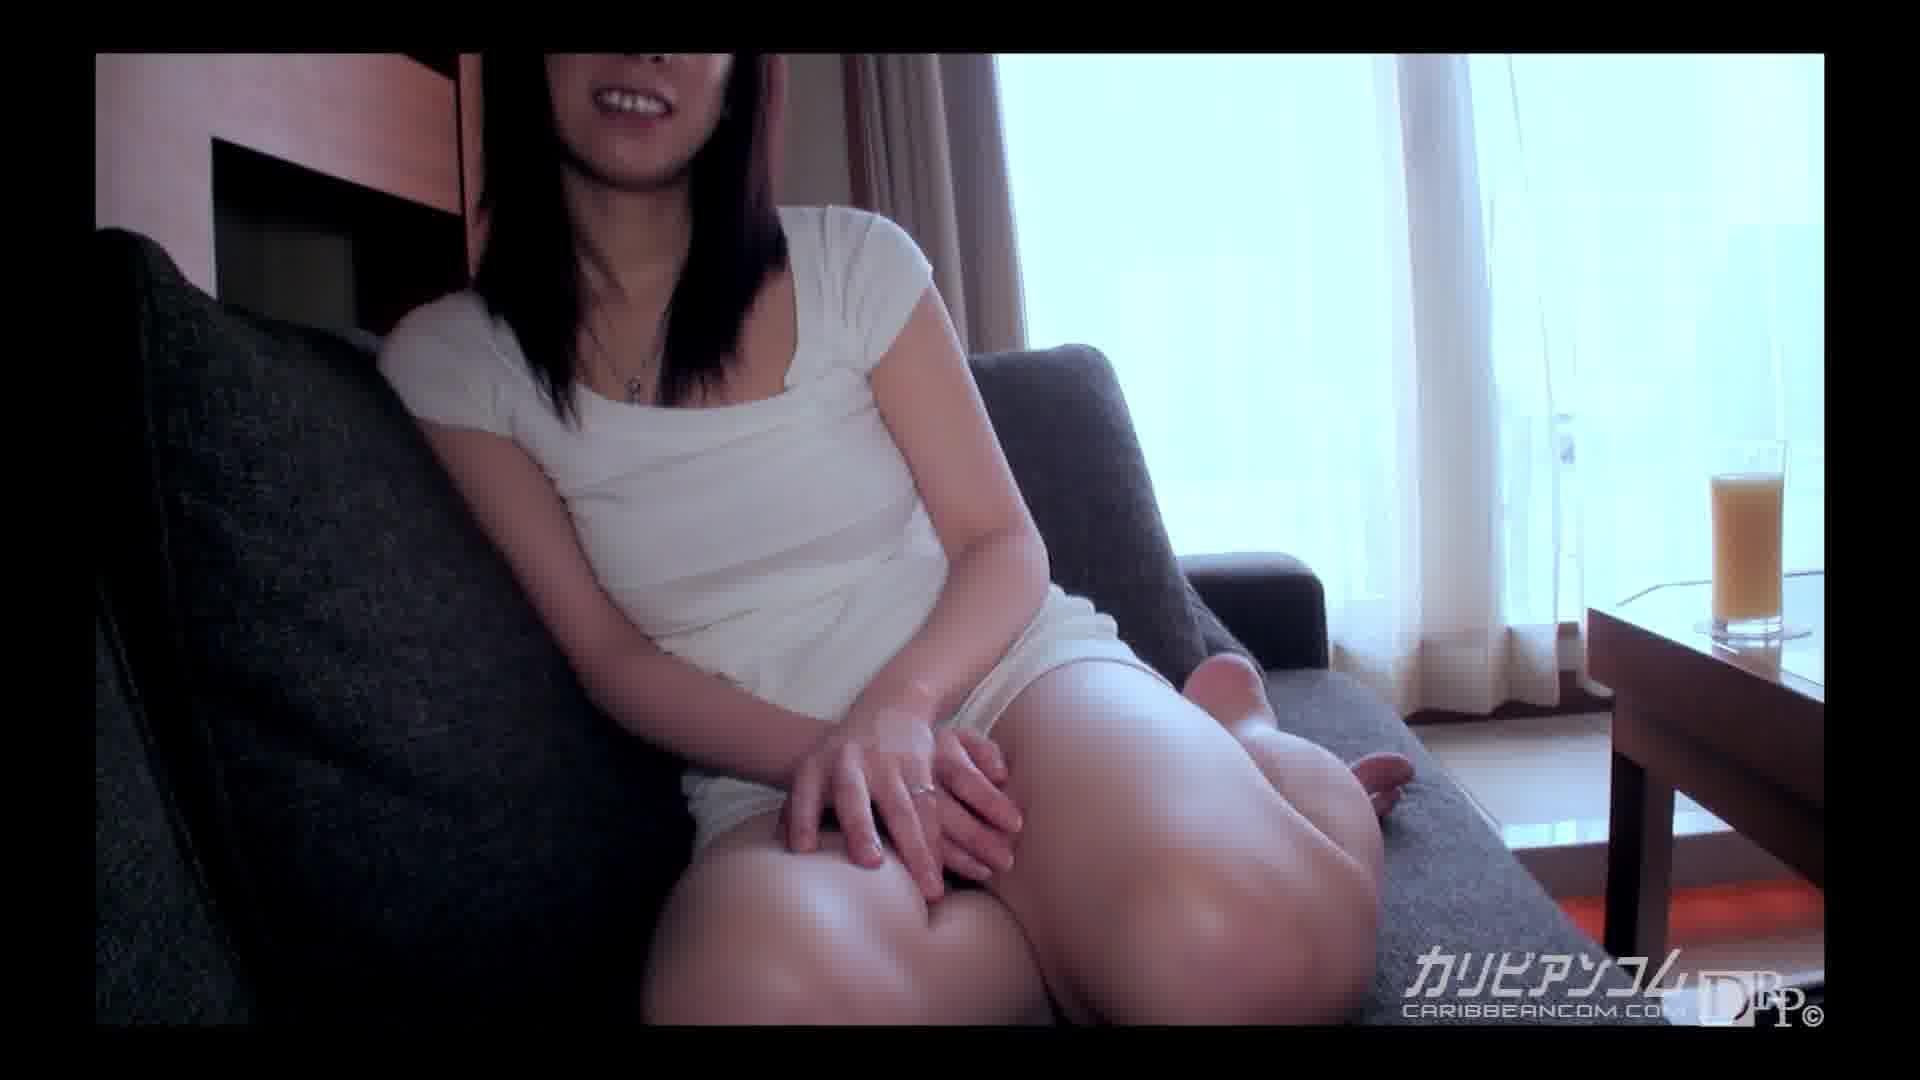 AV女優と飲み…そして泊まりSEX by HAMAR 6 後編 - ASUKA【巨乳・痴女・中出し】